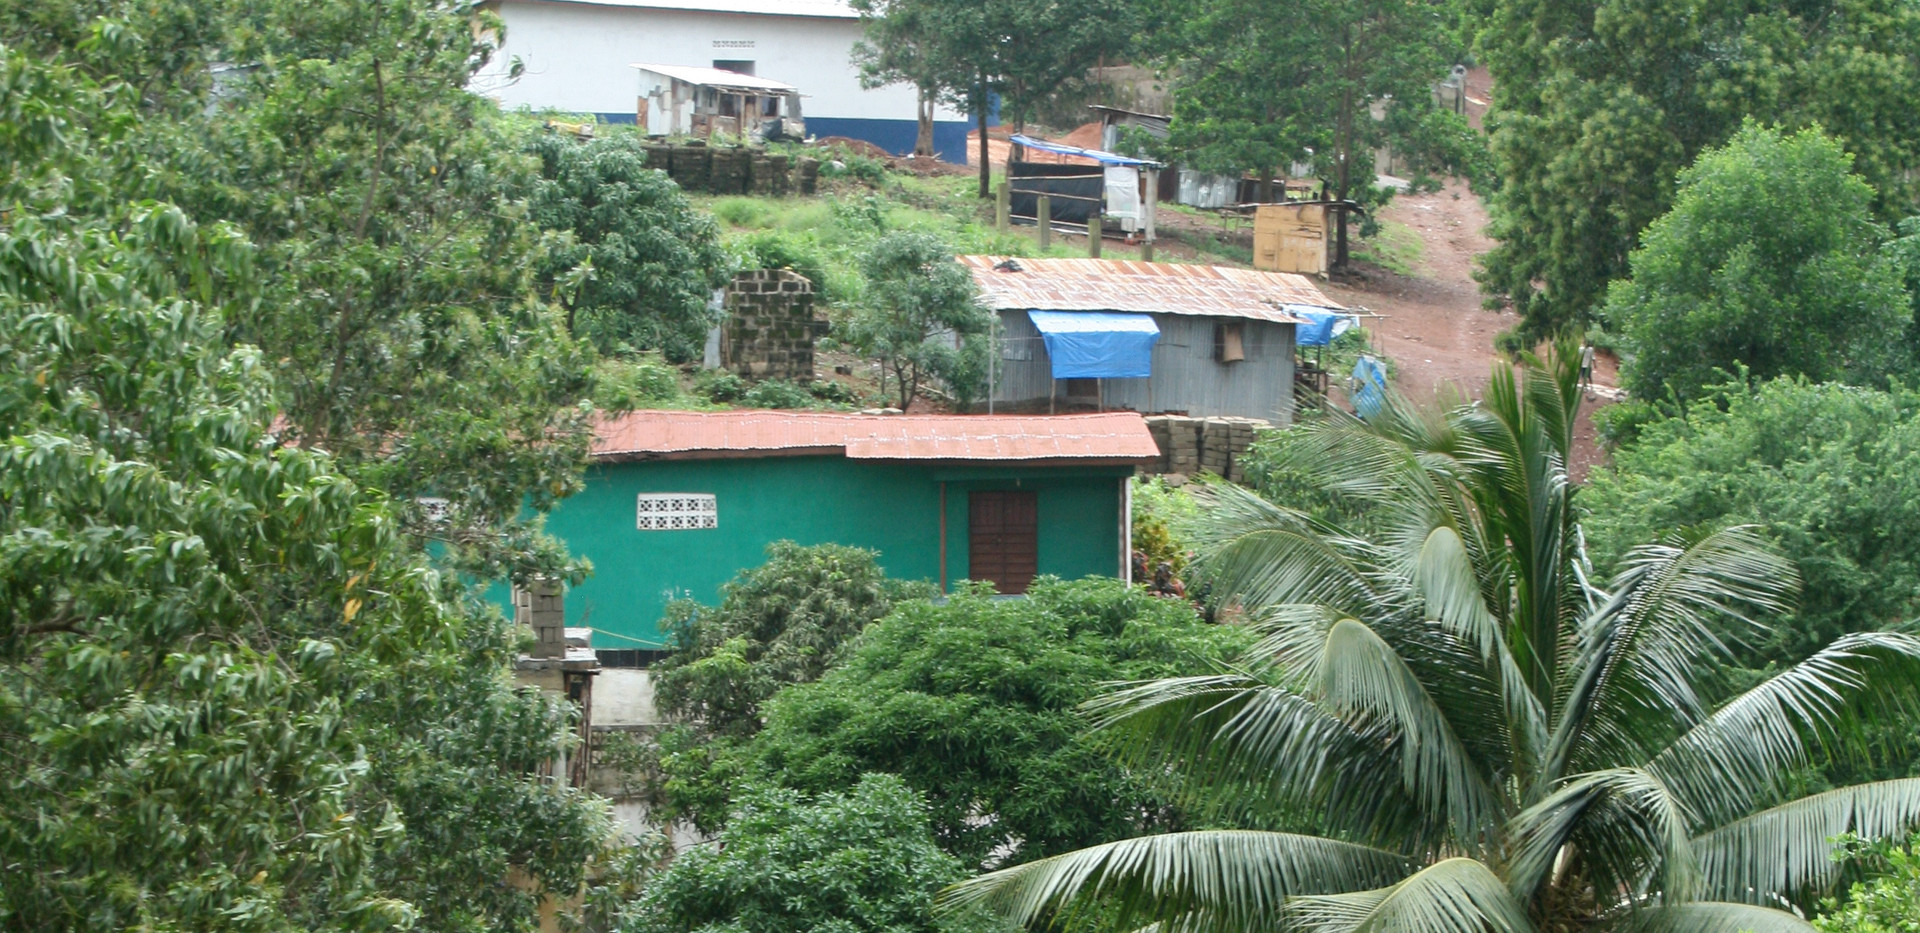 Kaningo Bridge & School